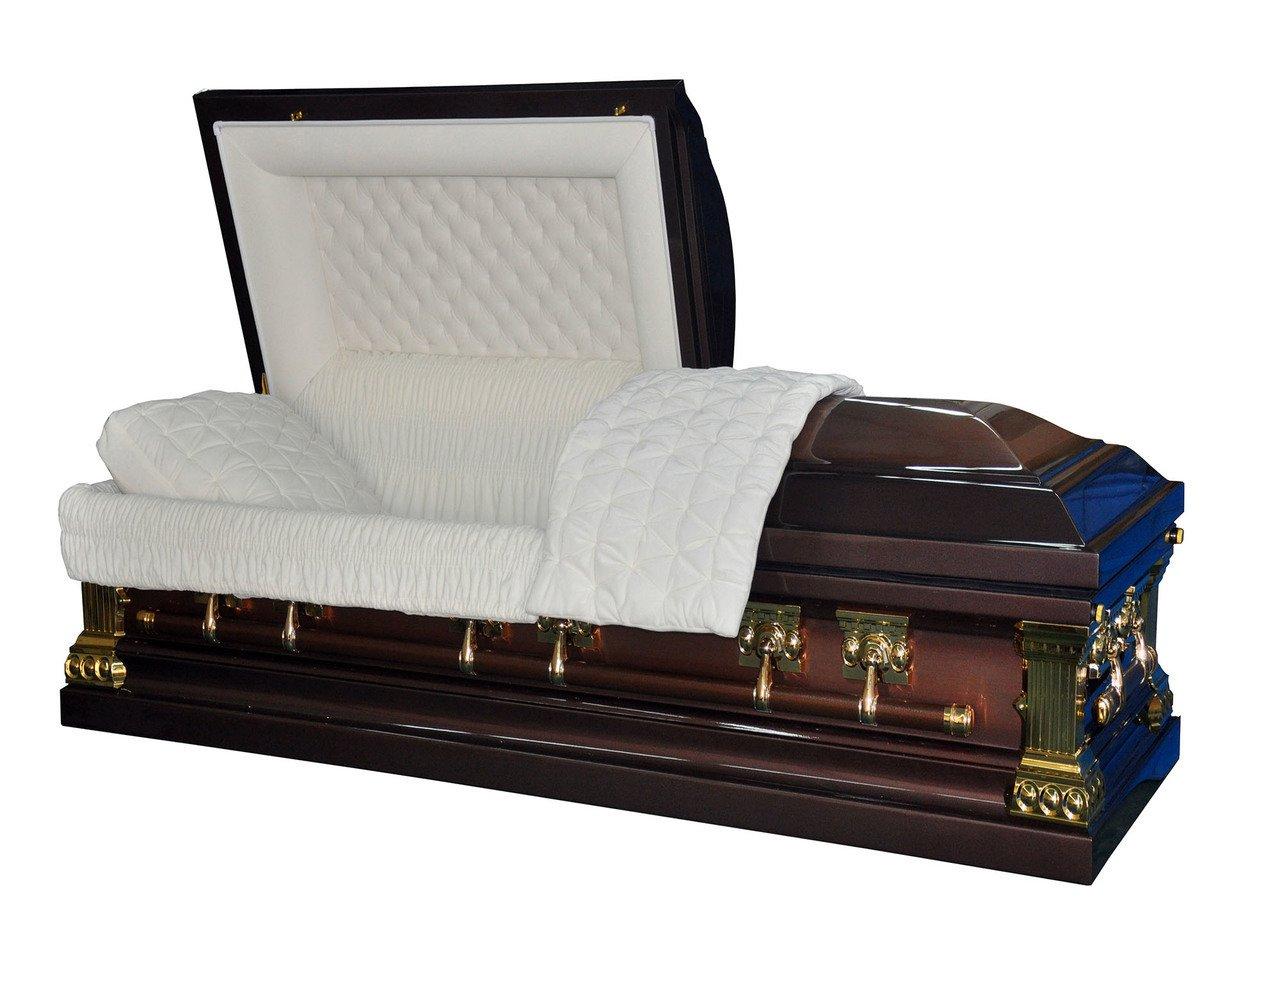 Overnight Caskets - Heritage Bronze Finish with White Interior 18 Gauge Metal Casket / Coffin